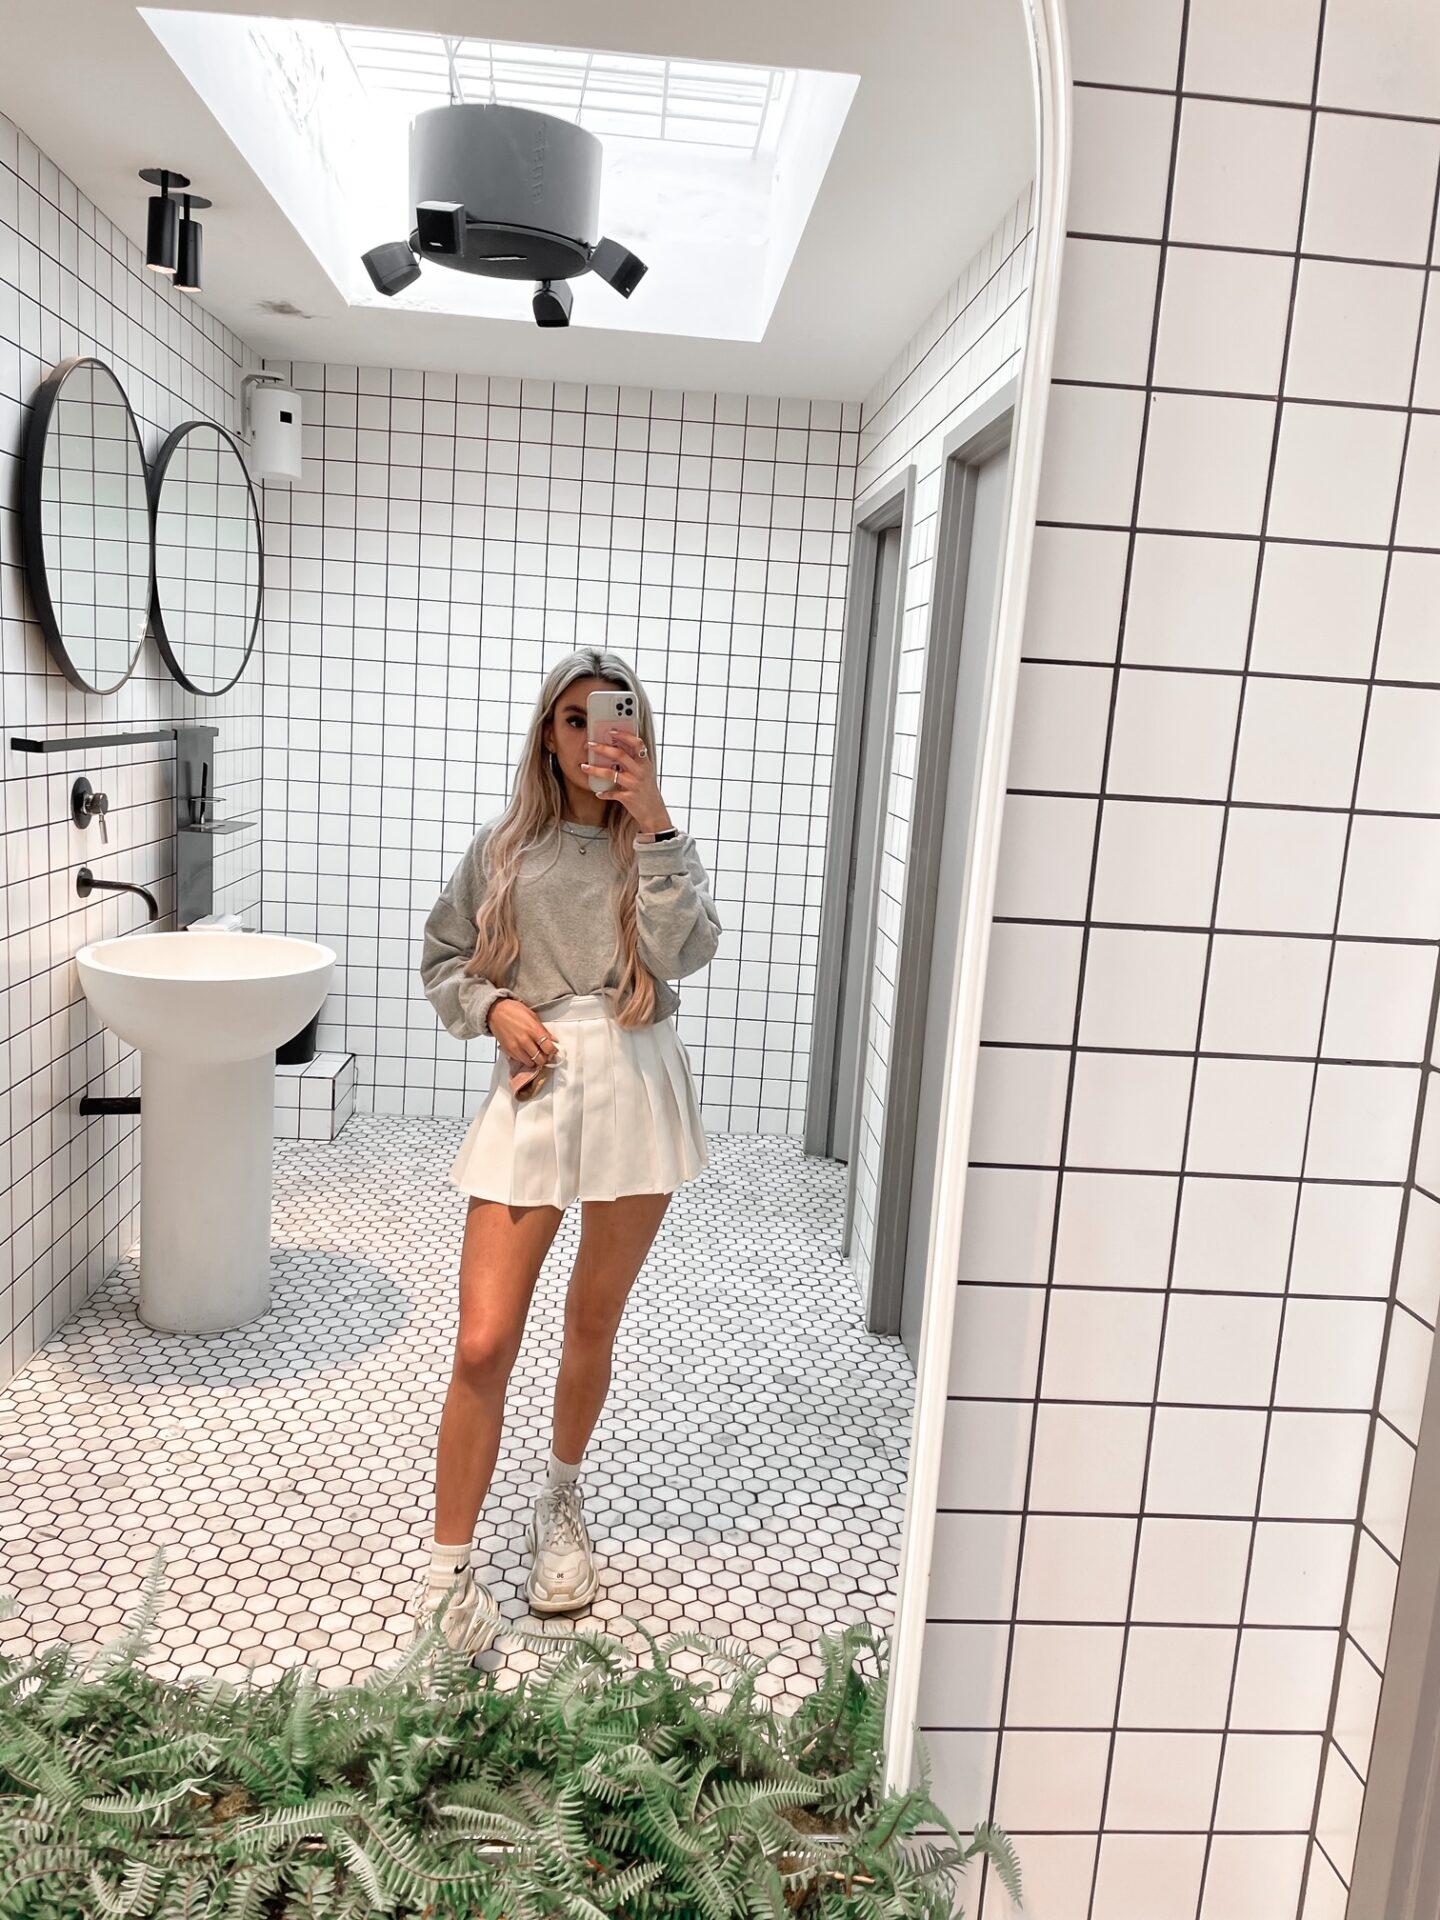 yasmin stefanie tennis style outfit